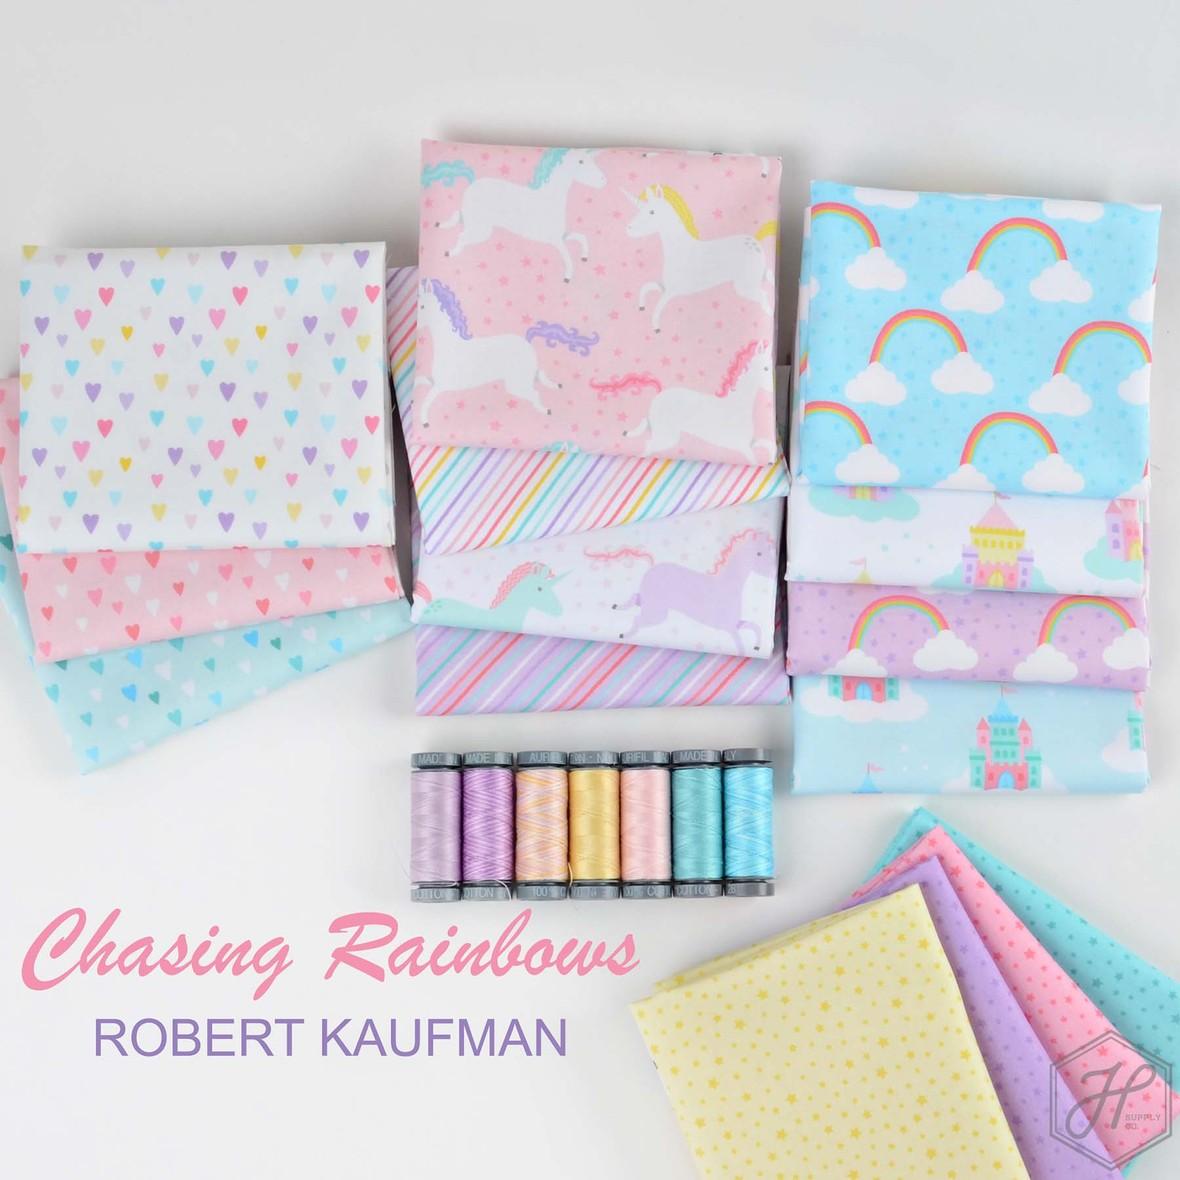 Chasing Rainbows Fabric Poster Robert Kaufman at Hawthorne Supply Co